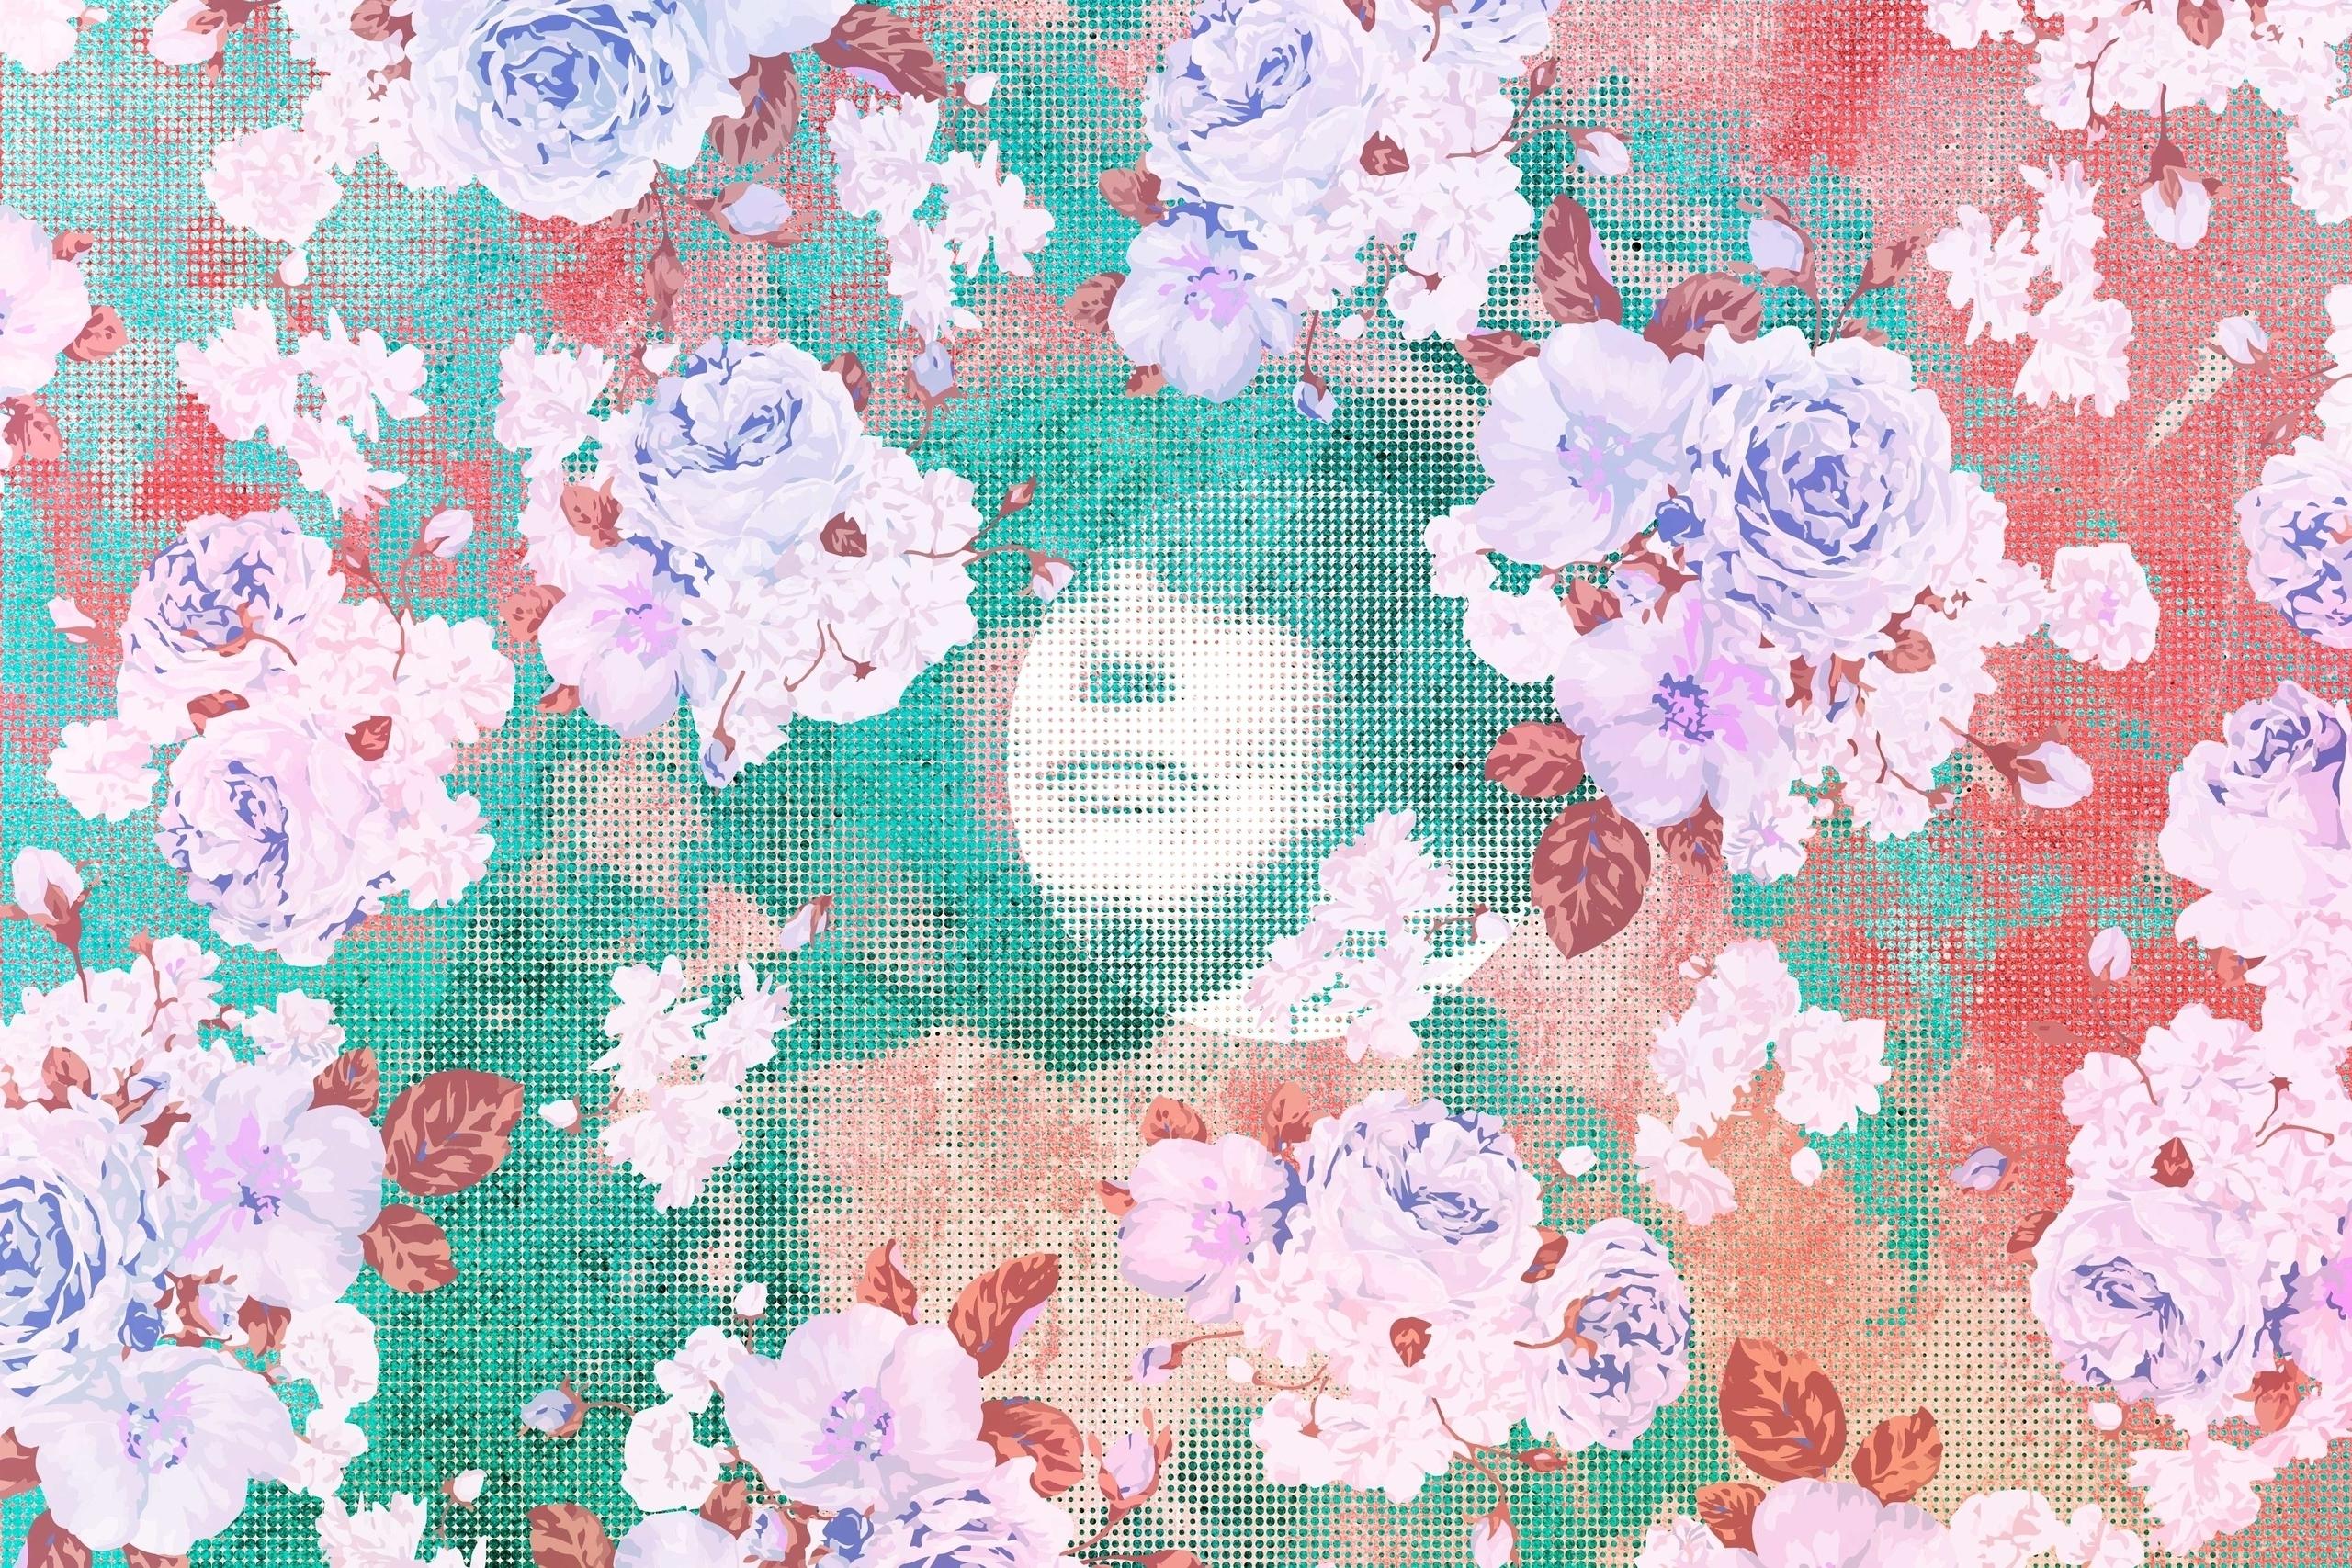 03_Composite_Collage.jpg